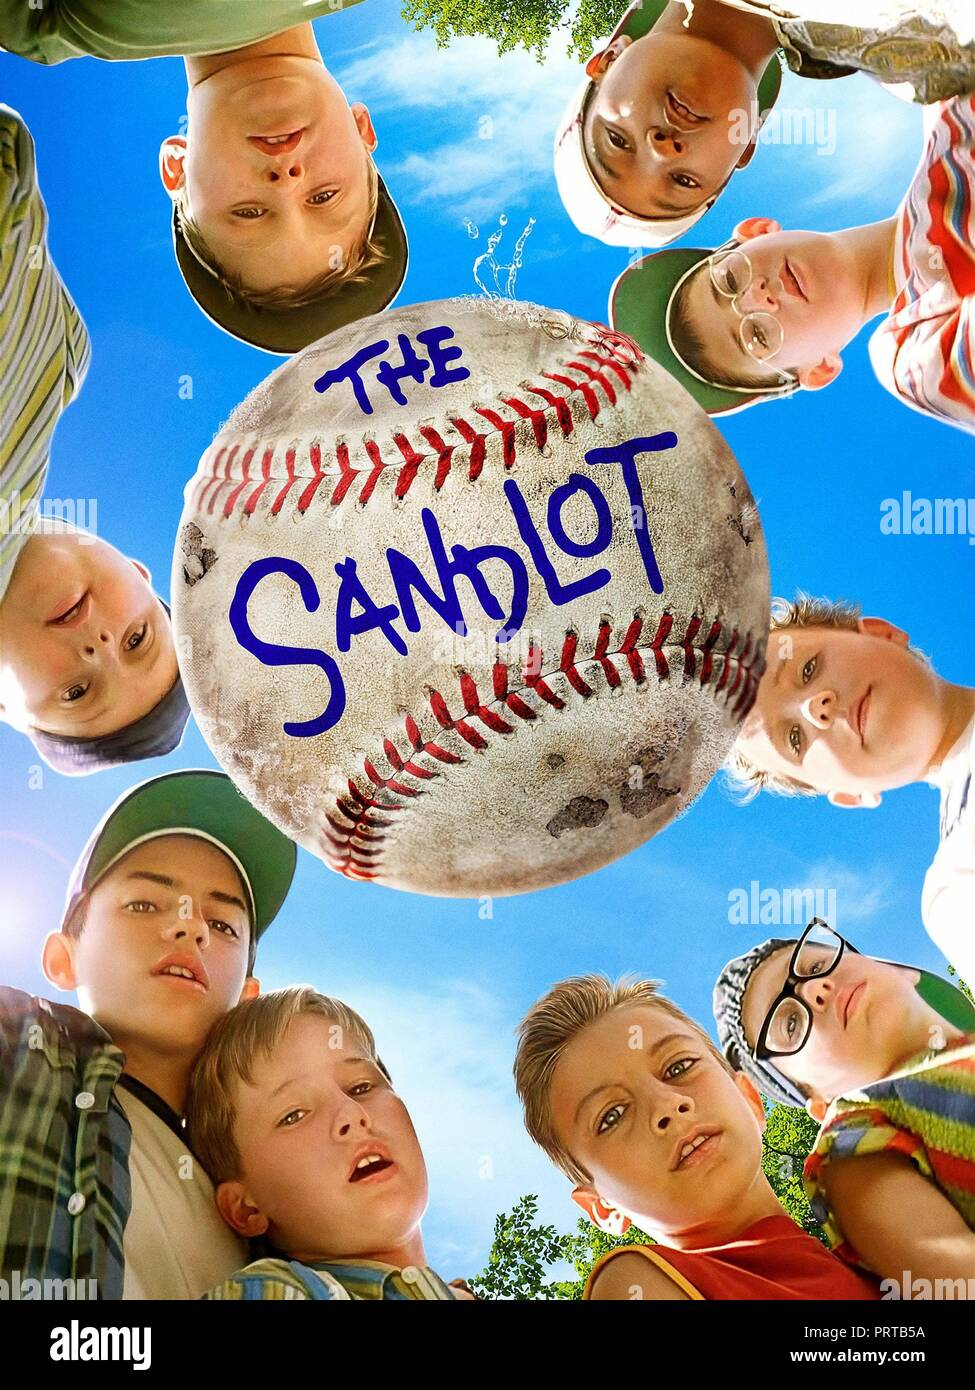 ae37fdb5ba0 Original film title  THE SANDLOT. English title  THE SANDLOT. Year  1993